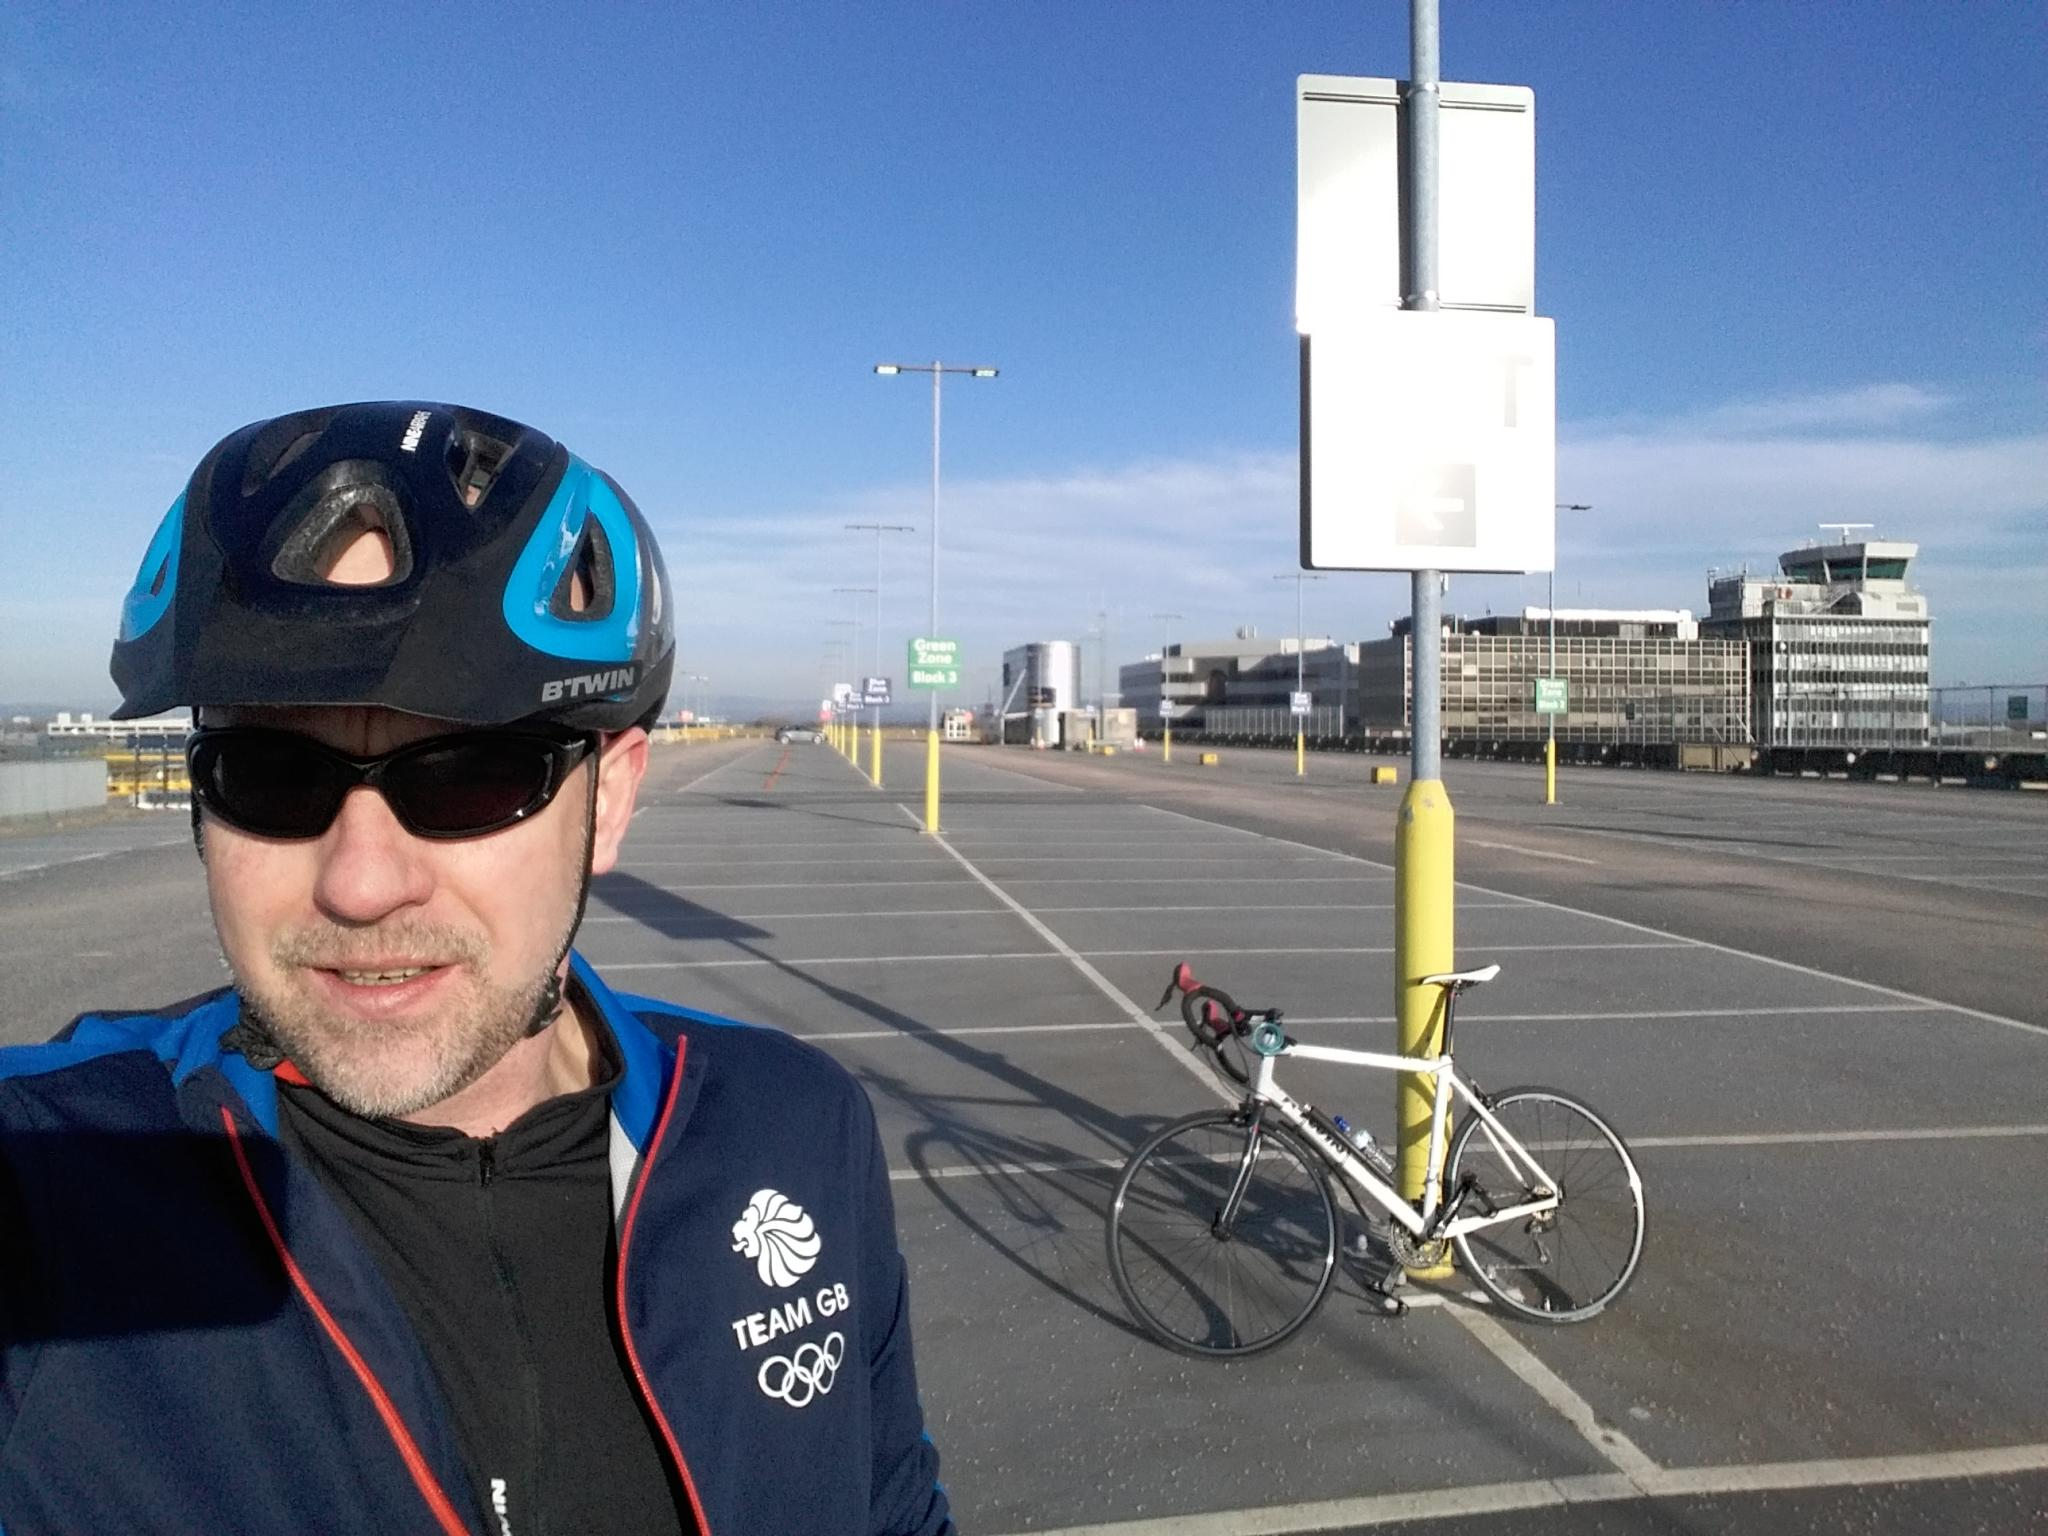 On my bike-20200322_163258-jpg